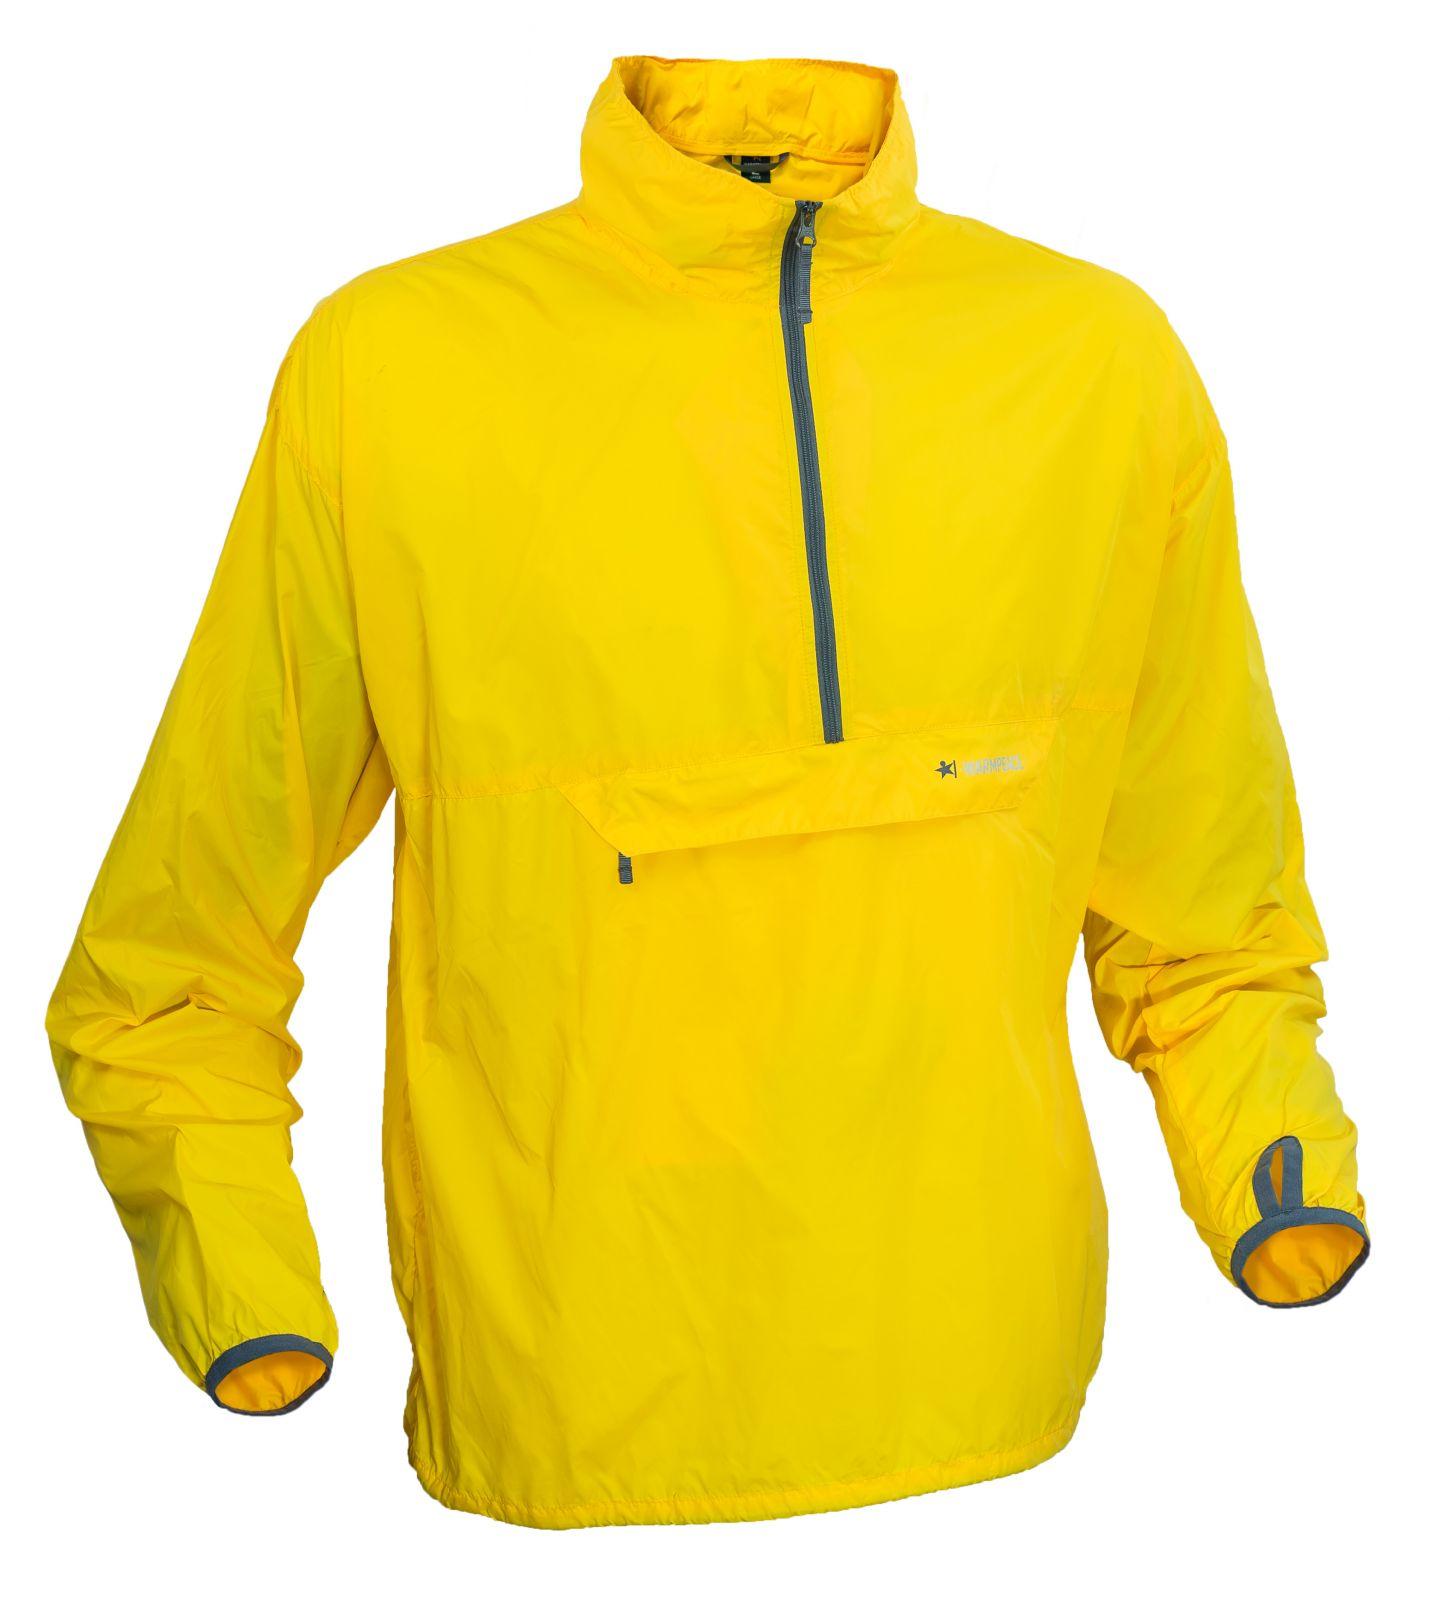 Warmpeace Escape yellow Ultralehká bunda přes hlavu Unisex